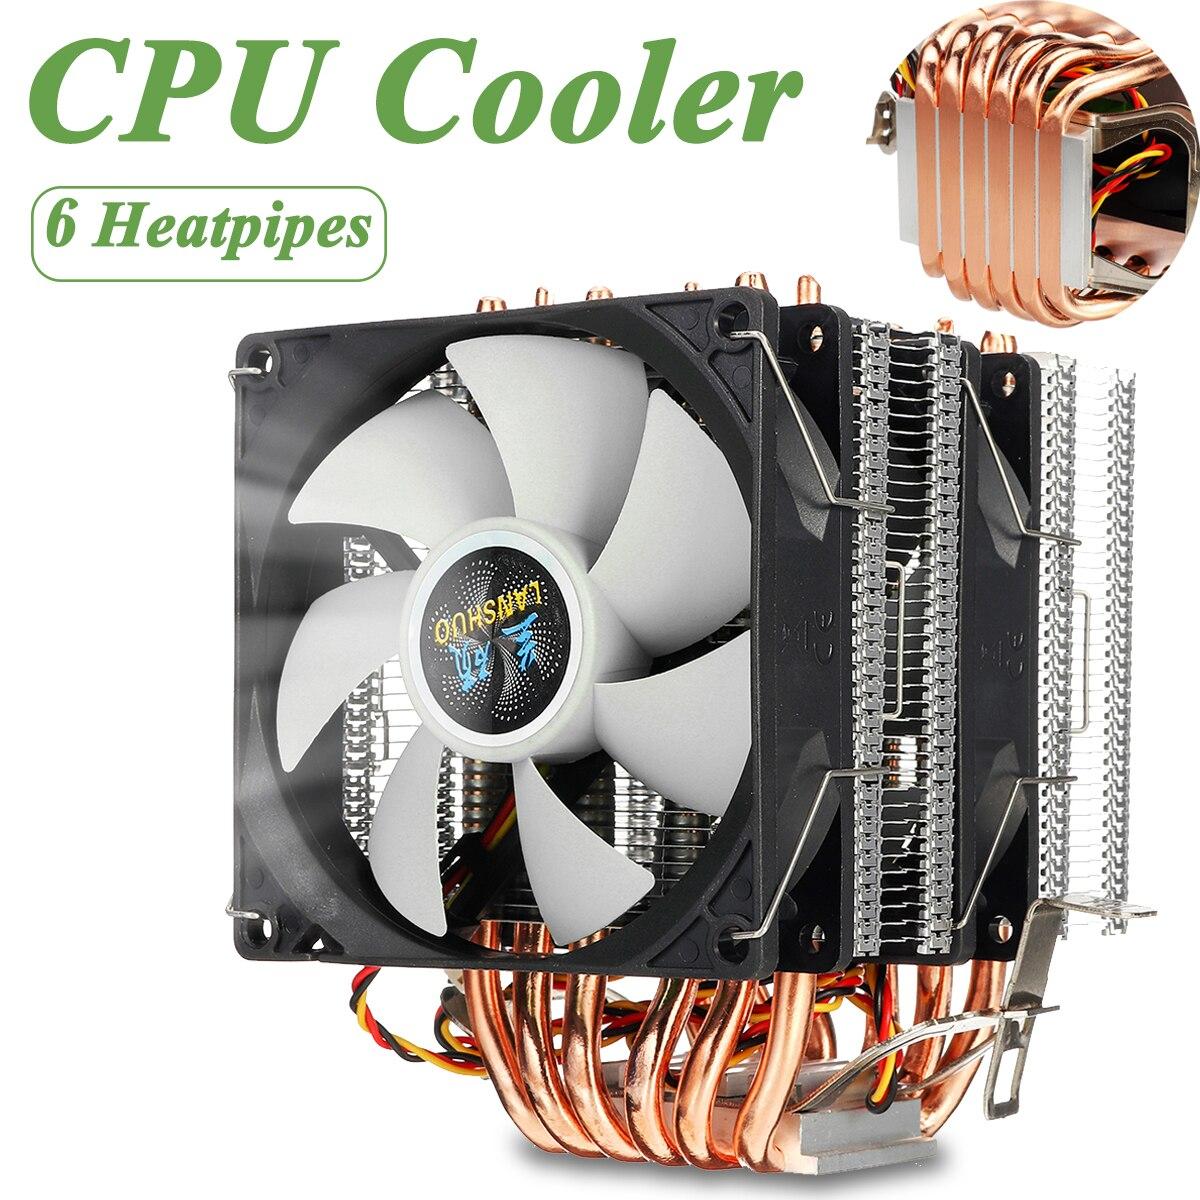 CPU Cooler 6 Heat Pipes 3pin Dual Fan Cooler Quiet Cooling Fan Heatsink Radiator for LGA 1150/1151/1155/1156/1366/775 for AMD